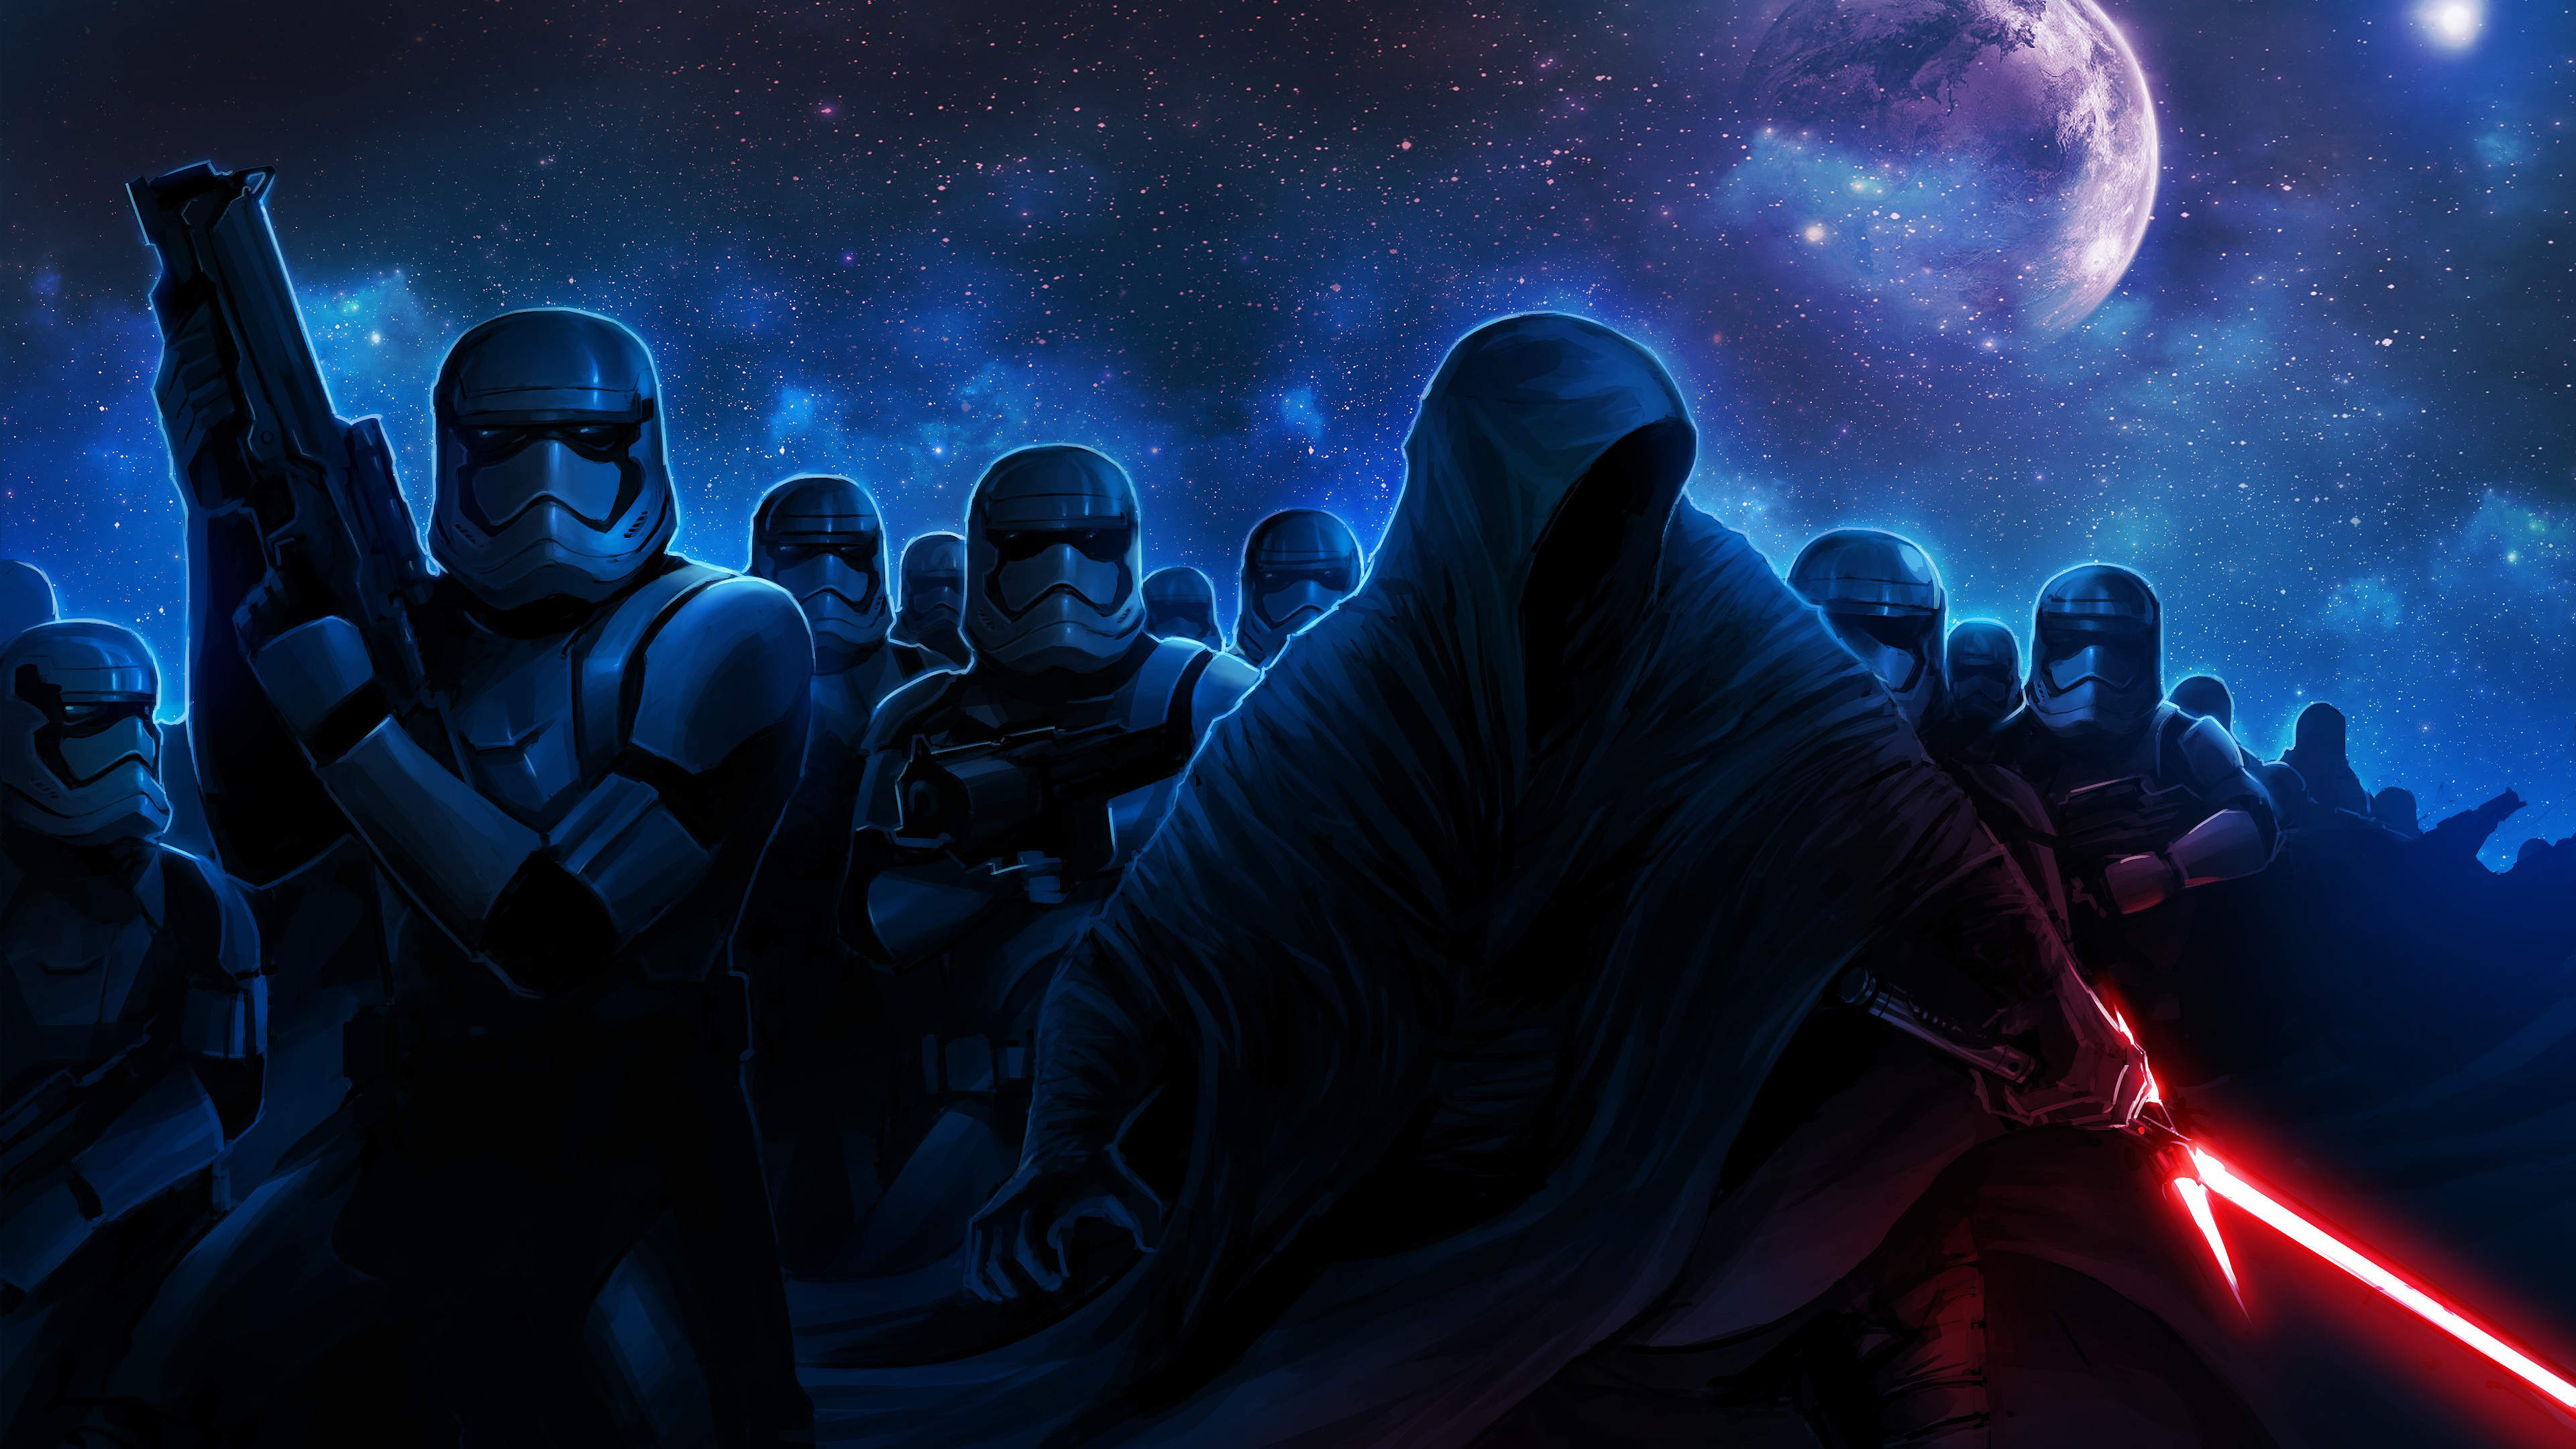 Vader 4k Wallpapers For Your Desktop Or Mobile Screen Free